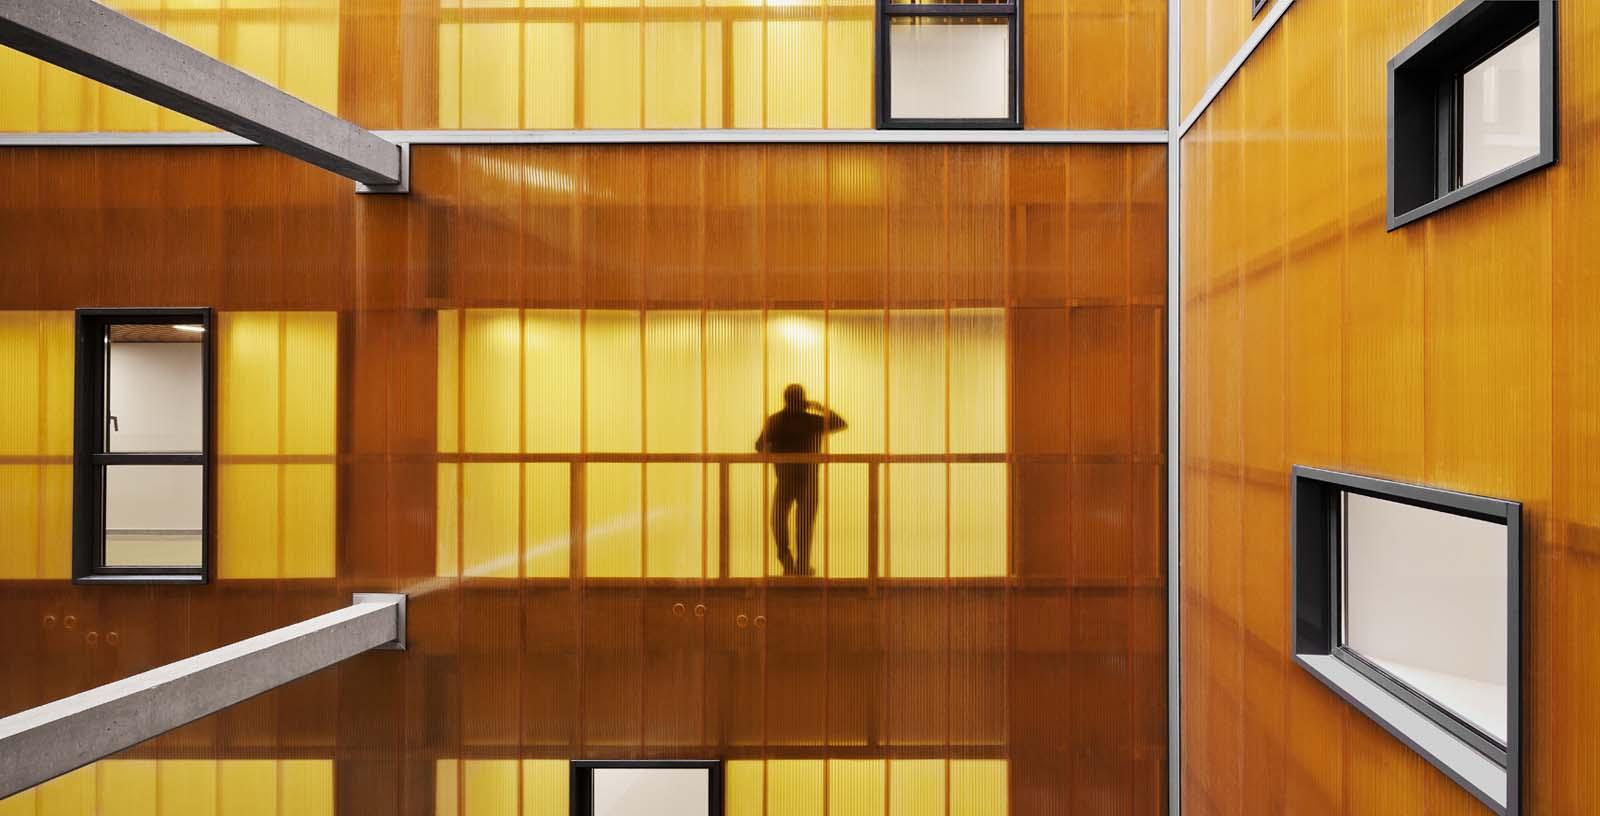 Engineerings_Schools_Building_Bilbao_03_Architecture_IDOM_photos_Aitor_Ortiz